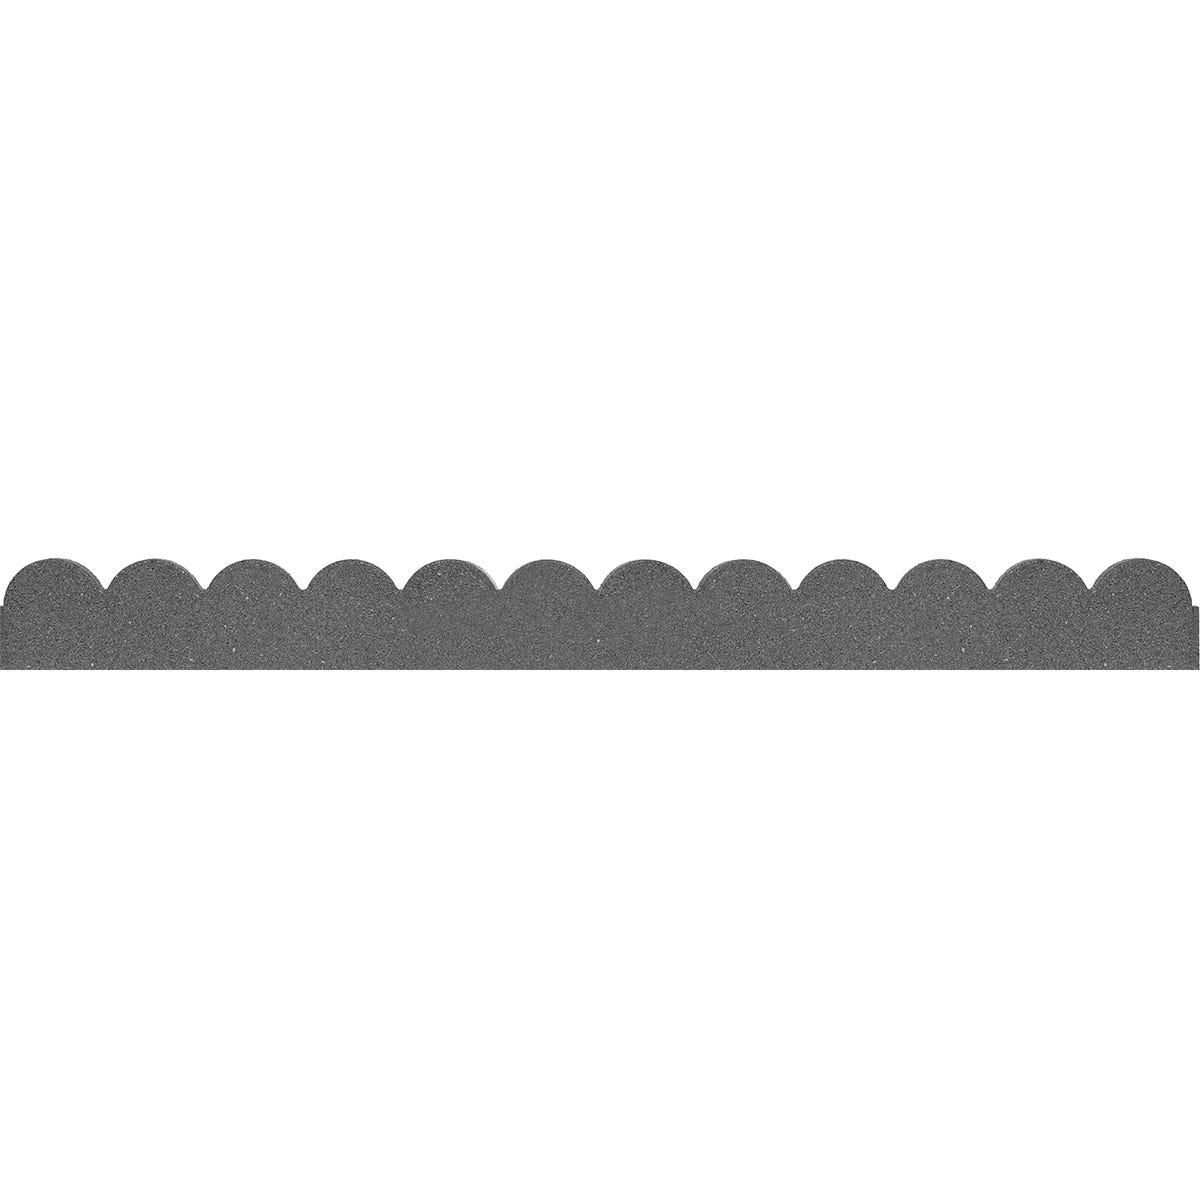 Robert Dyas Ez Border Flexi Curve Scallop Border - Grey